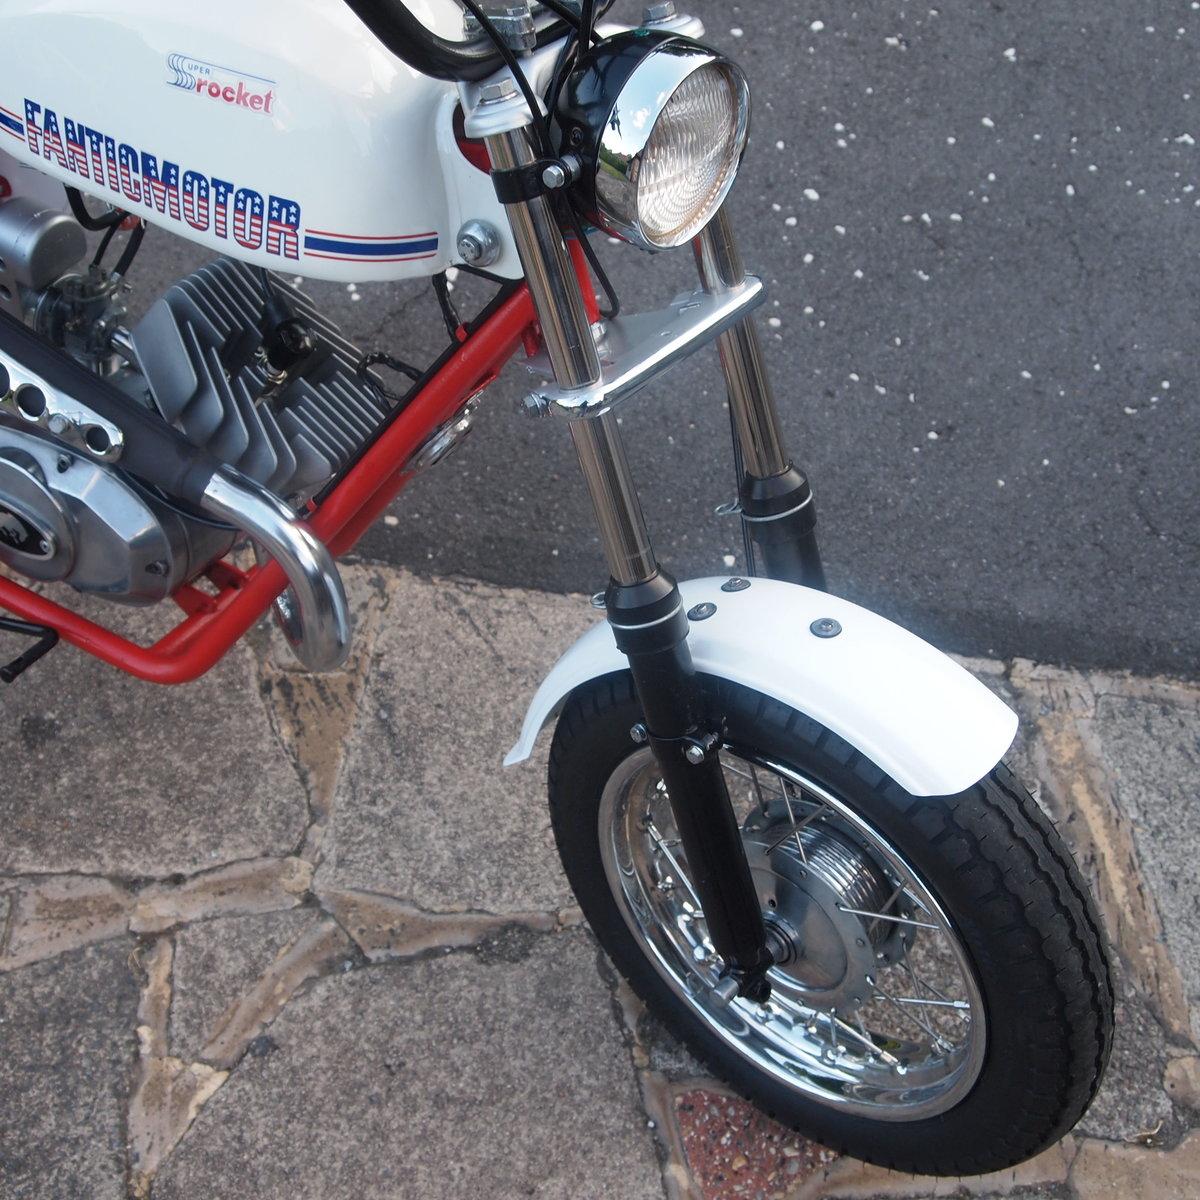 1973 Rare 49cc Fantic Super Rocket Monkey Bike, Wonderful. For Sale (picture 6 of 6)